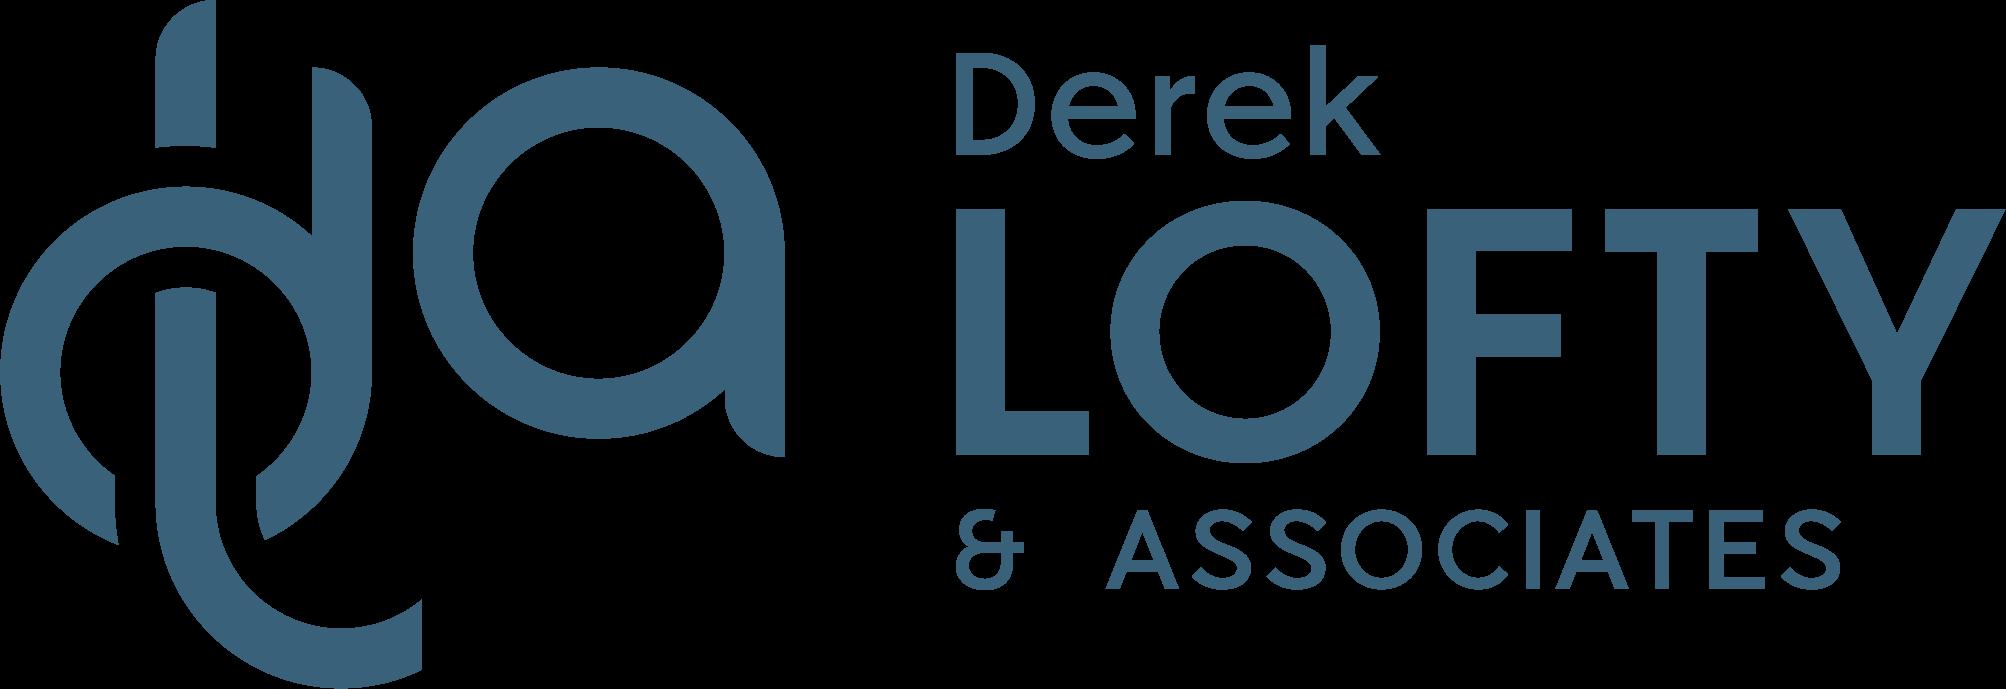 Derek Lofty and Associates